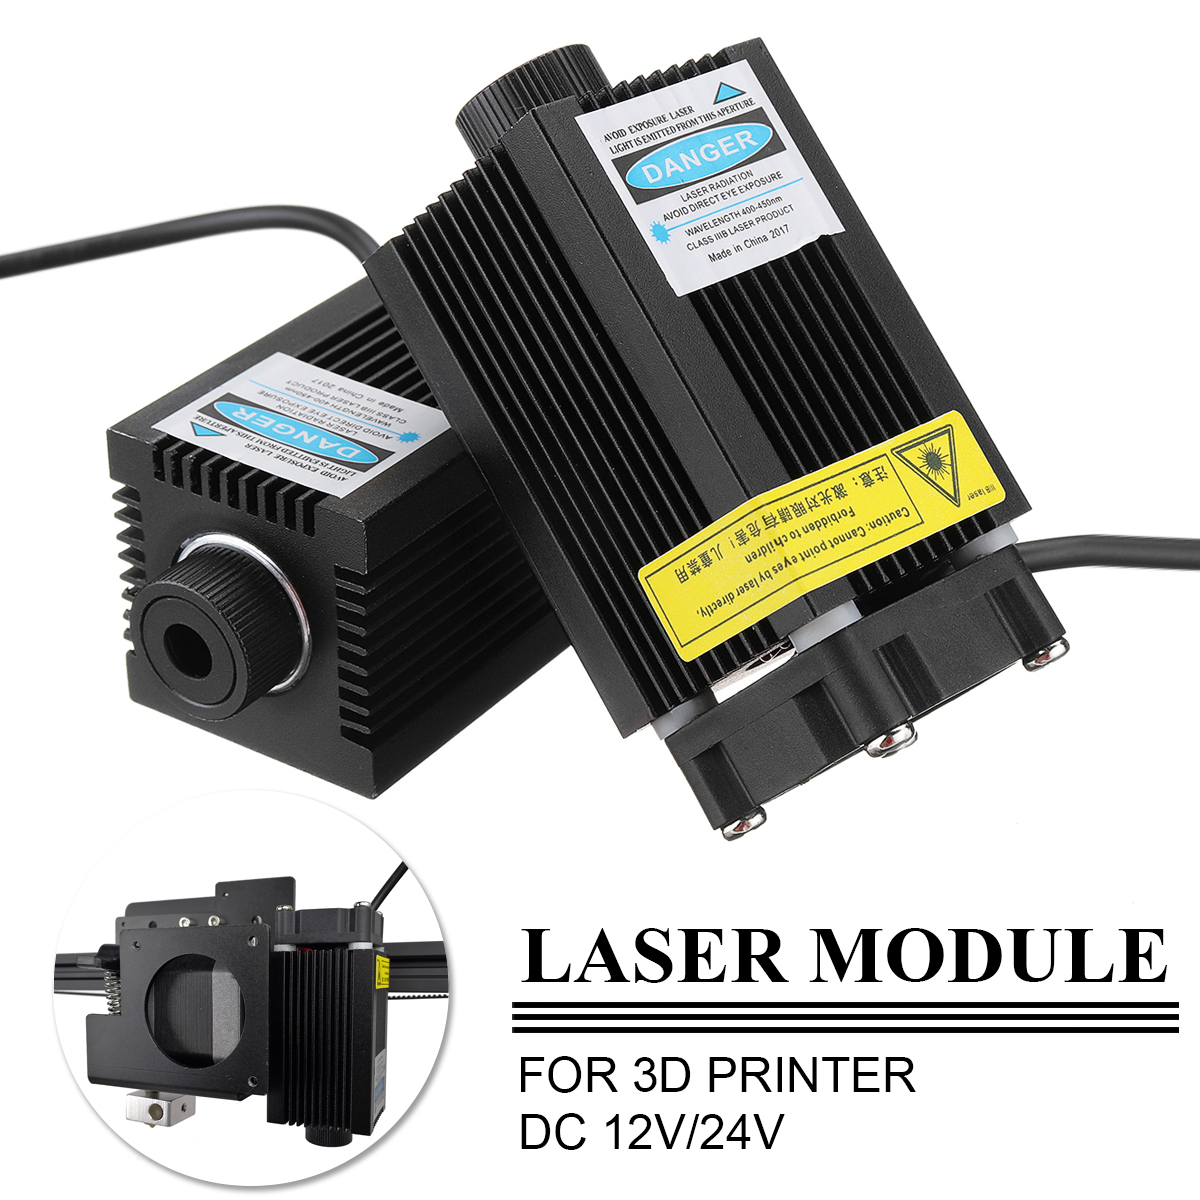 12V /24V 3D printer laser module laser engraving TTL module 500mw 405NM laser tube Laser module diode for 3D printer Accessory 500mw 2500mw 405nm focusing blue purple laser module laser engraving ttl module 500mw laser tube laser module diode